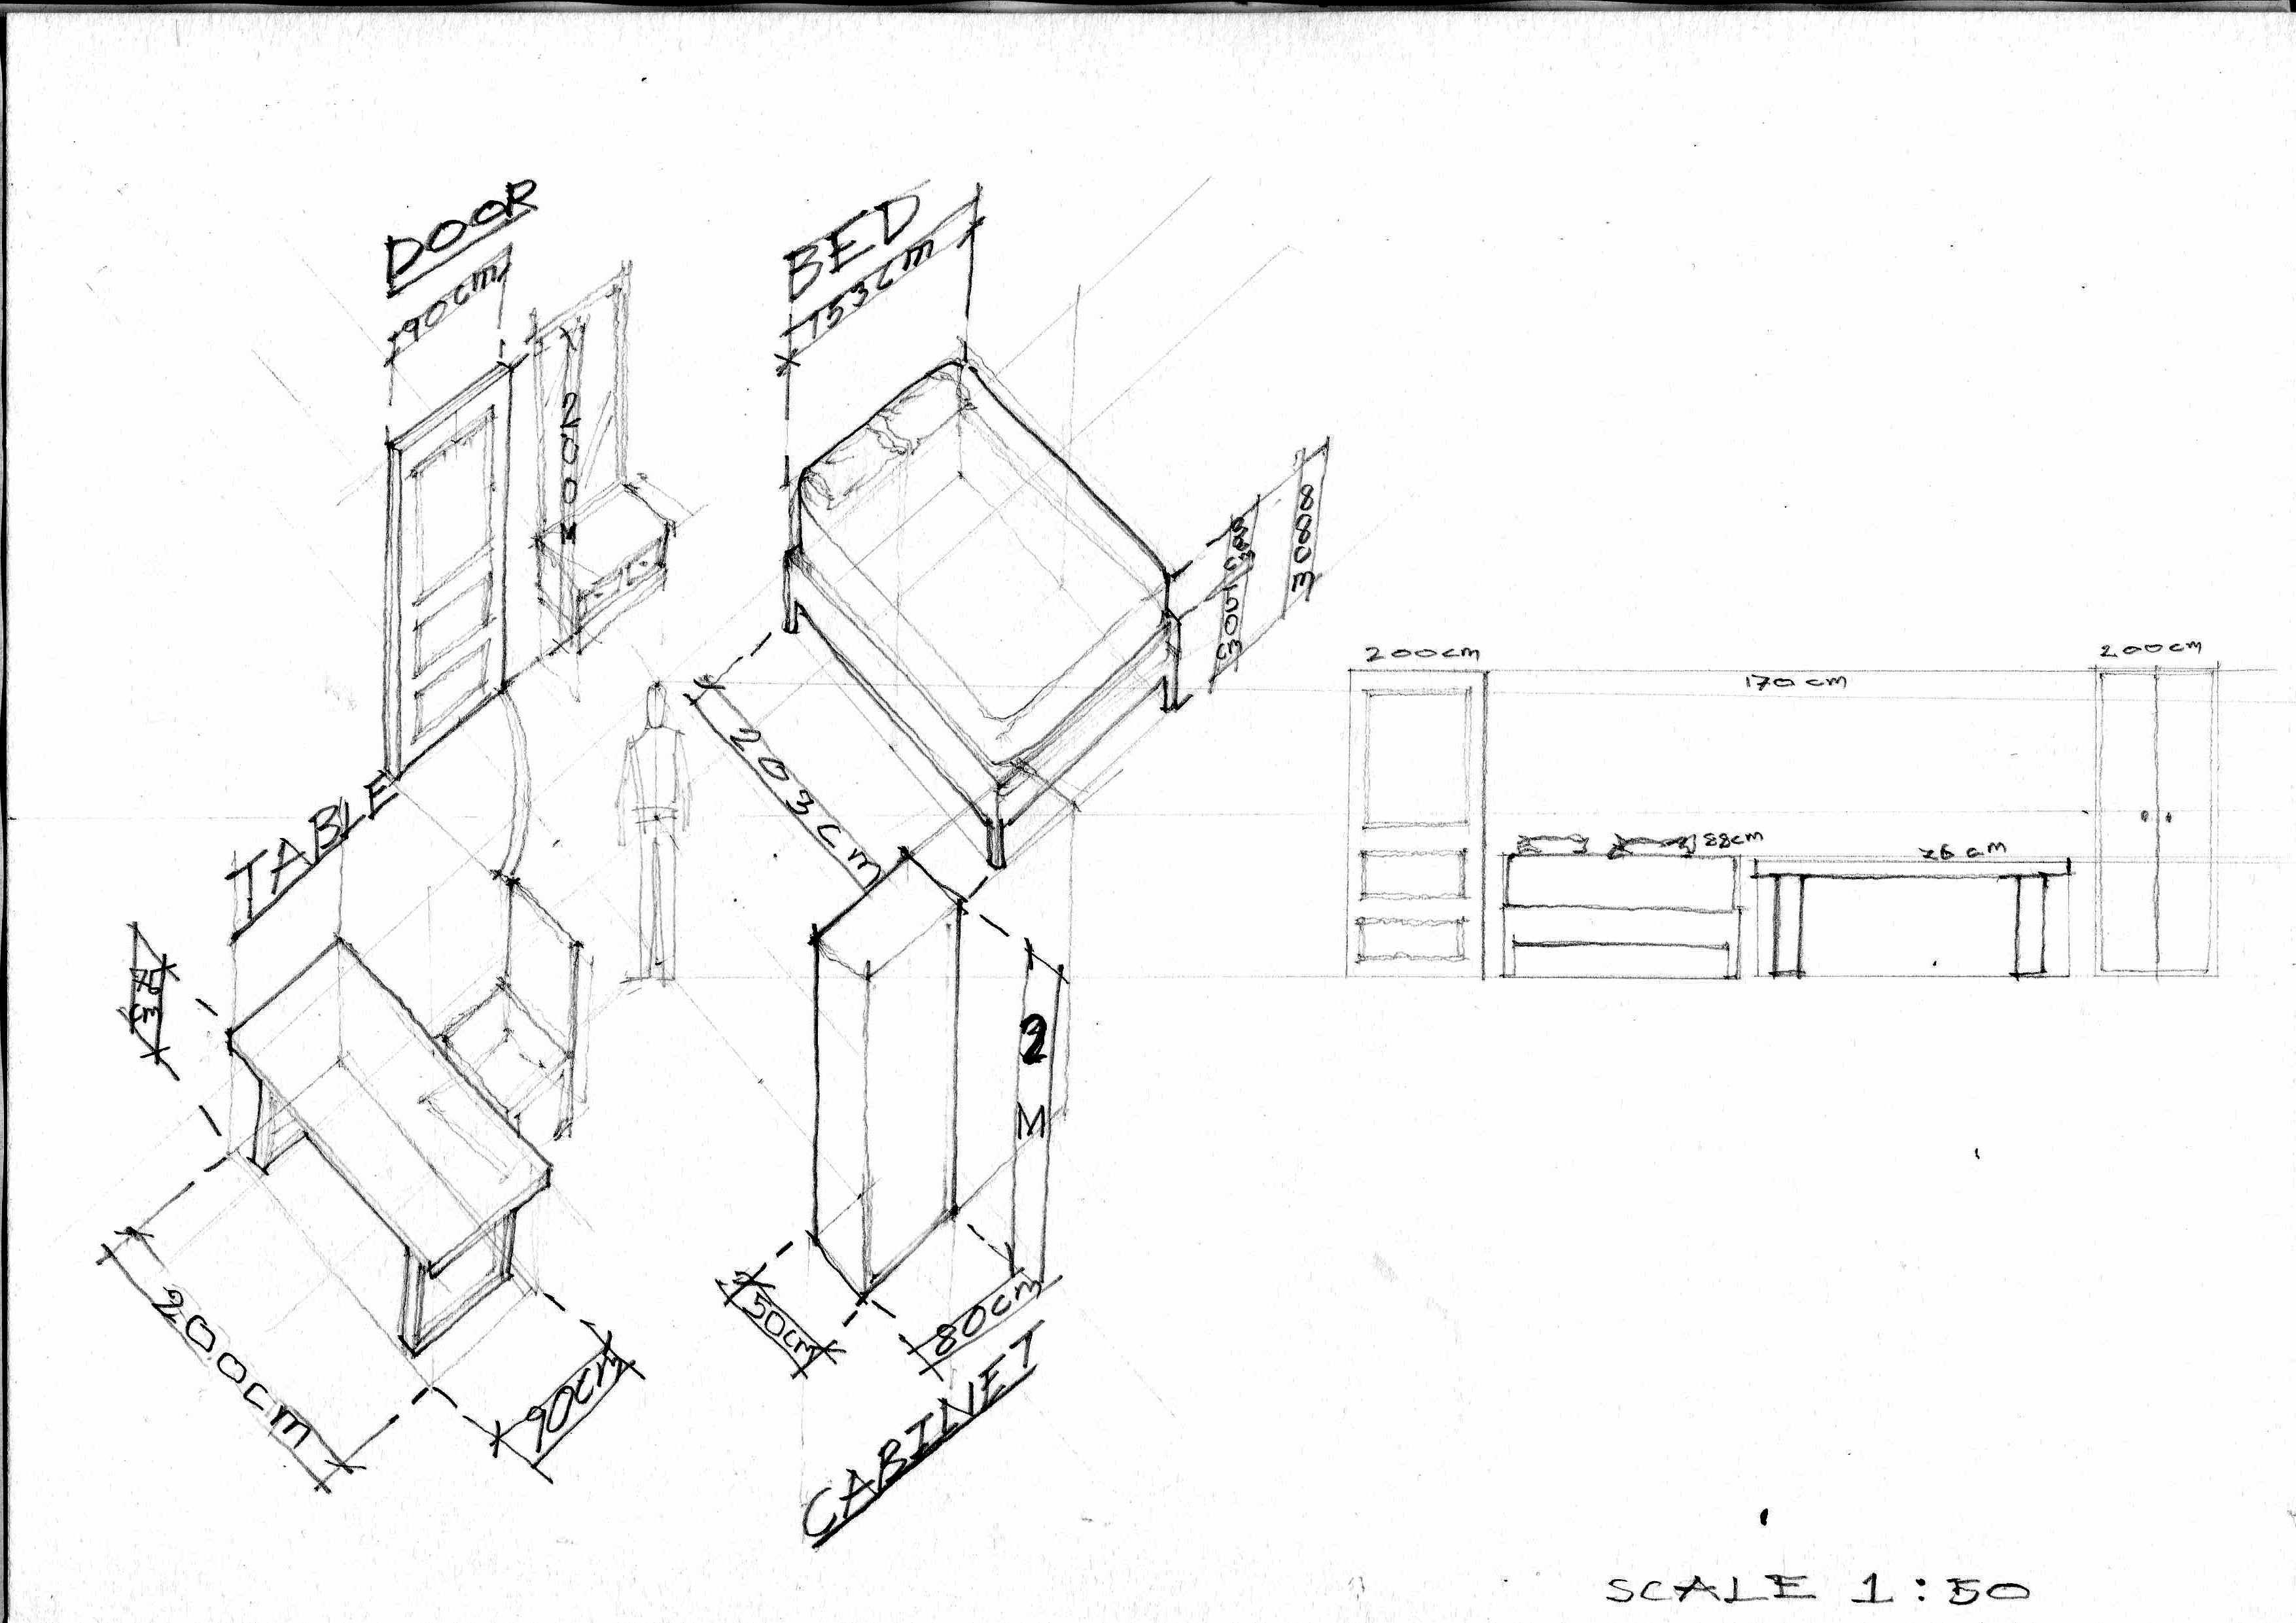 Suwijak Vanichvatana Jay 5634815825 Taxonomy of Physical Interaction with Furniture